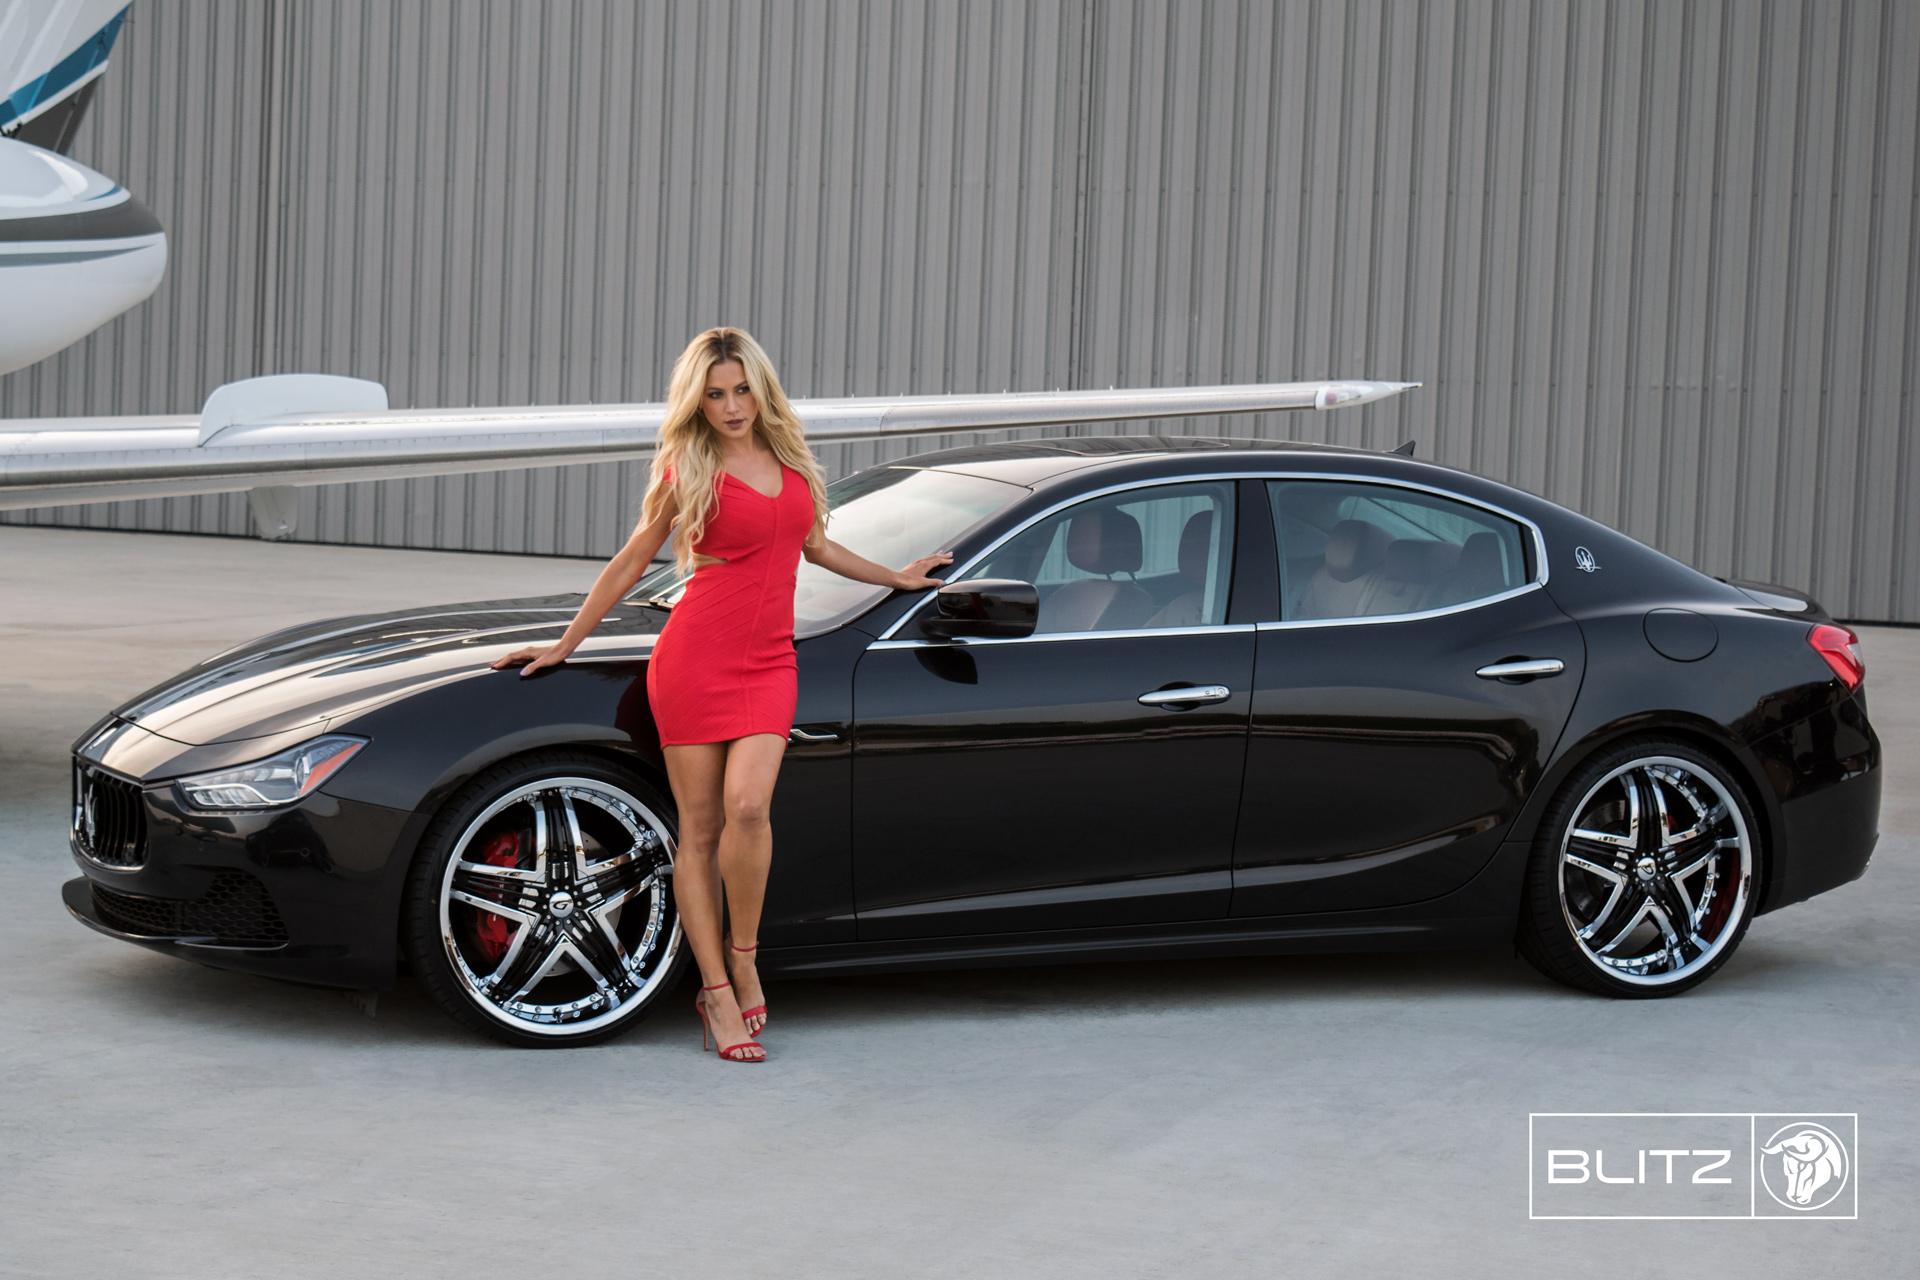 Blitz Diablo Wheels Maserati Ghibli